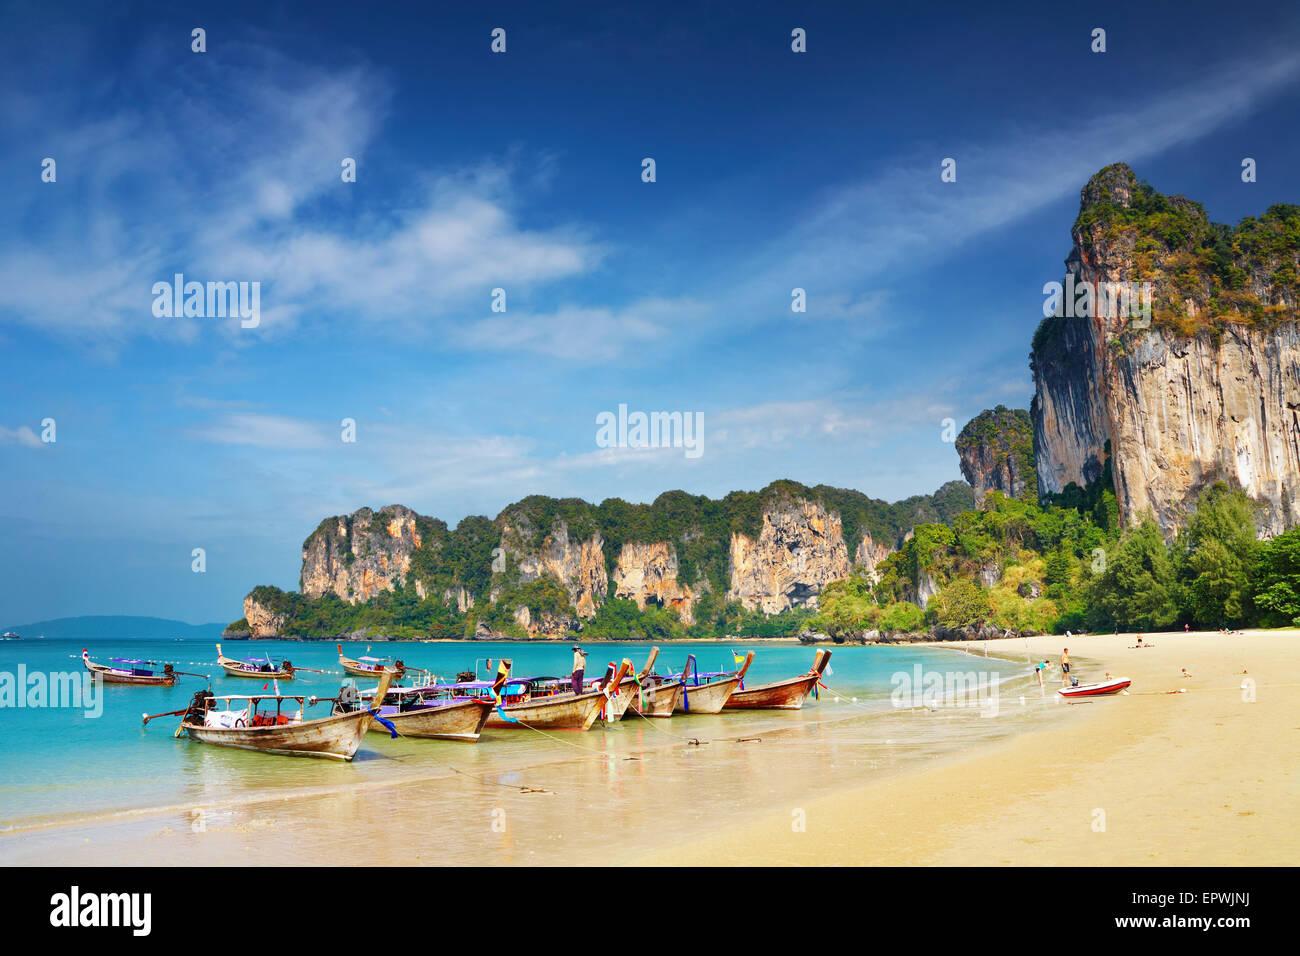 Tropical beach, la mer d'Andaman, Thaïlande Photo Stock